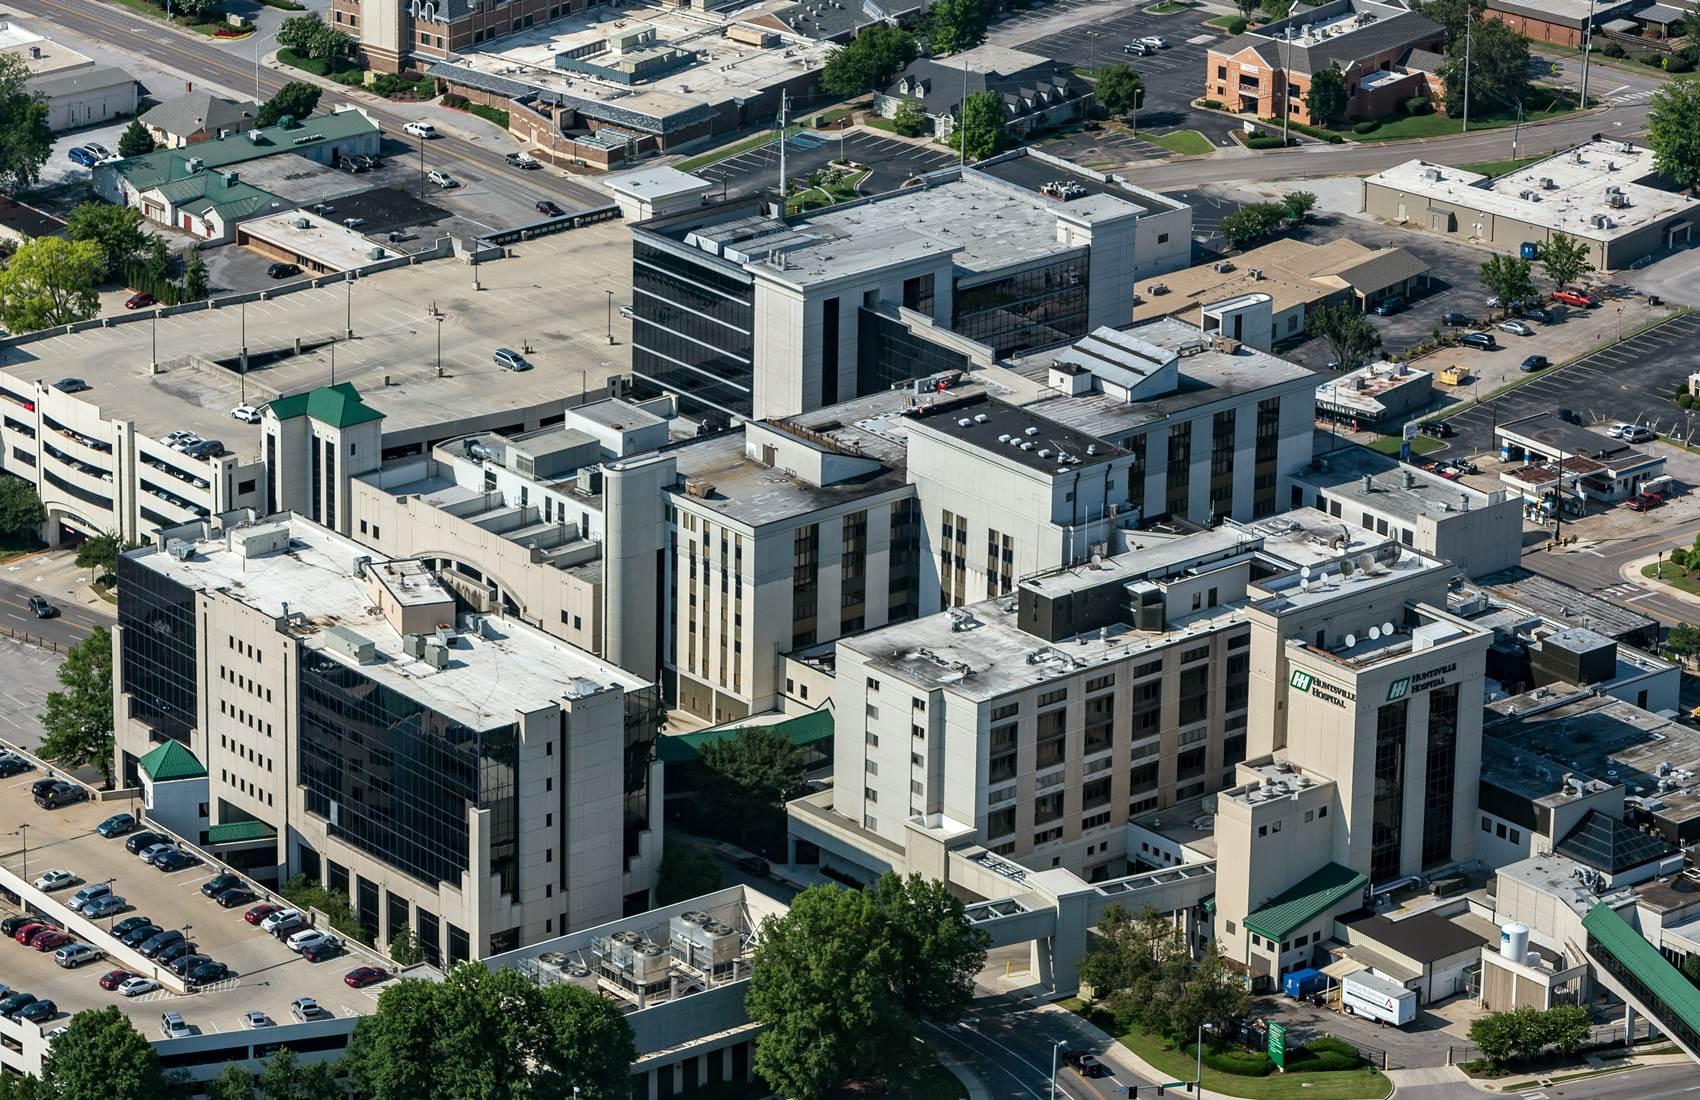 Aerial view of Huntsville Hospital